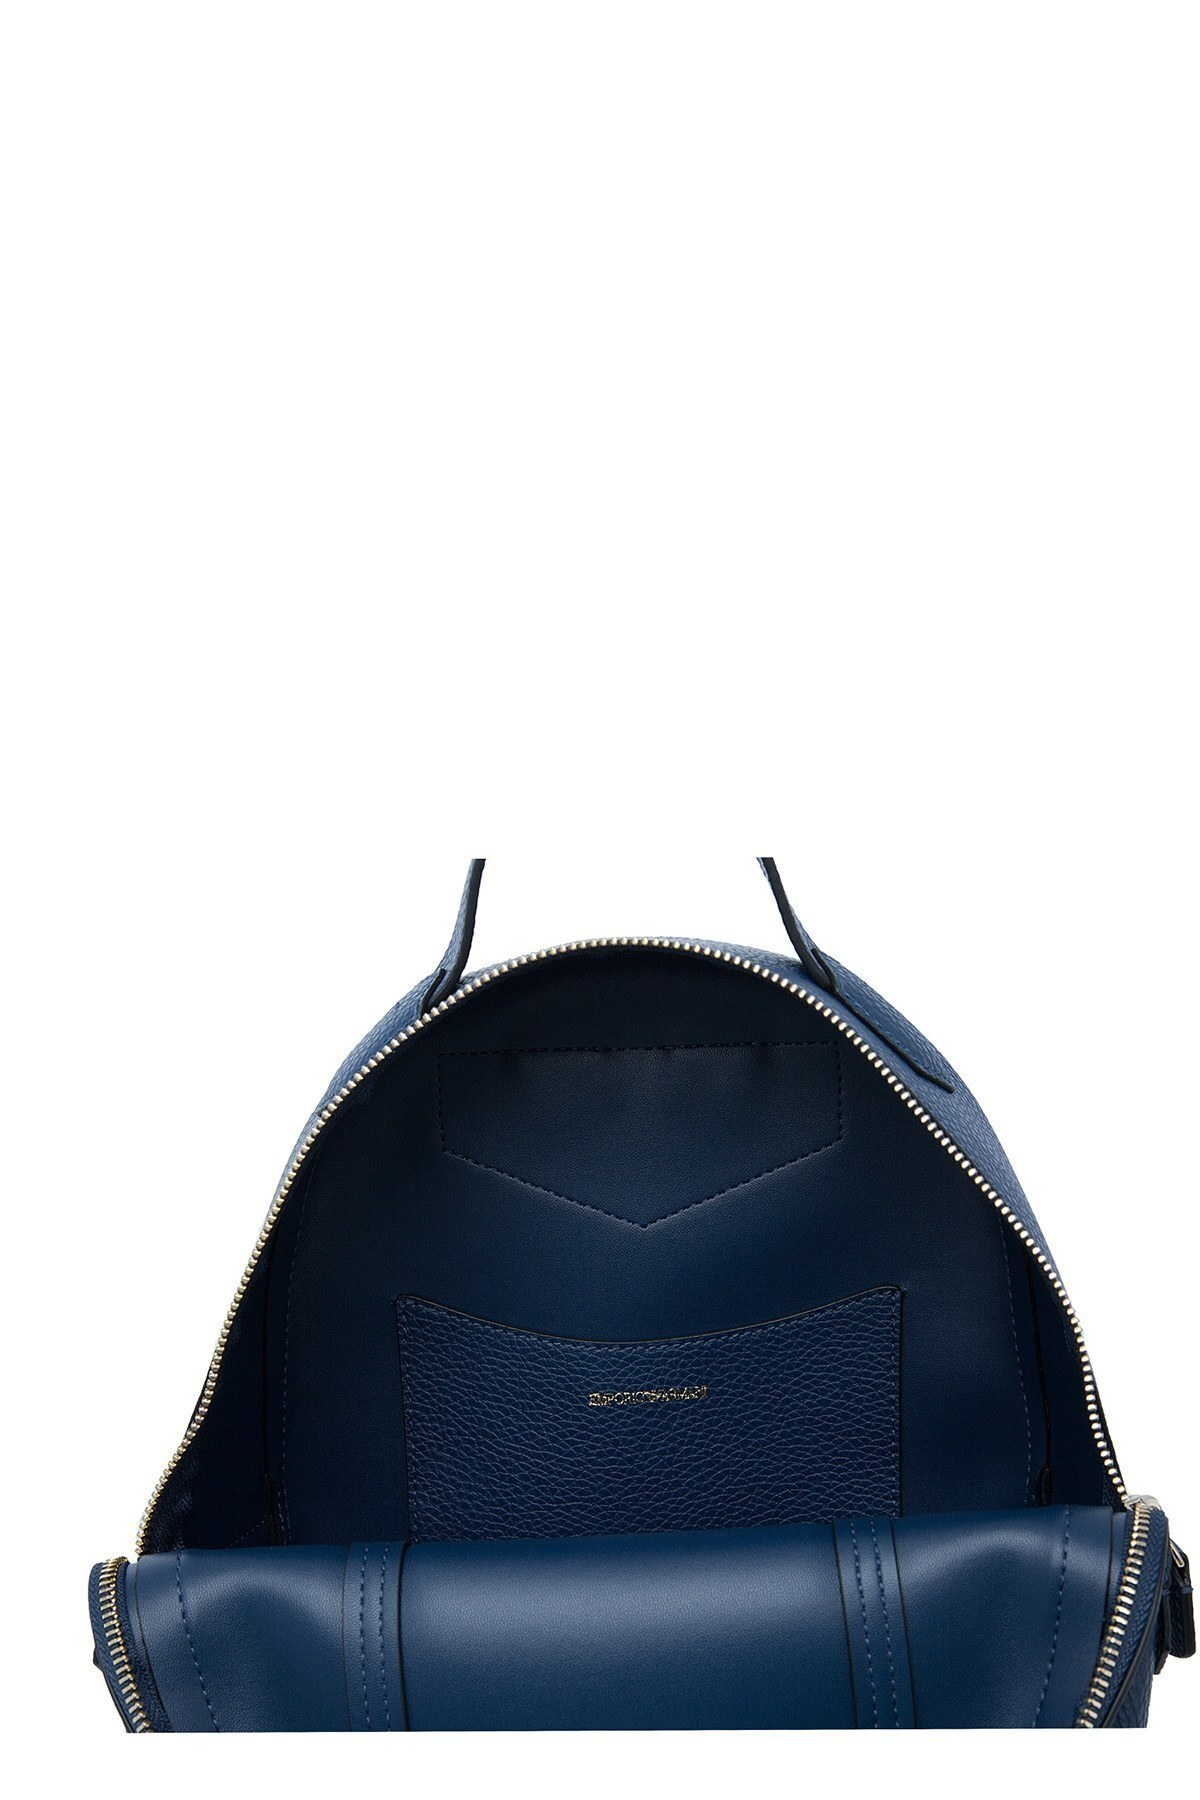 Emporio Armani Kadın Çanta S Y3L030 YH22A 80132 LACİVERT